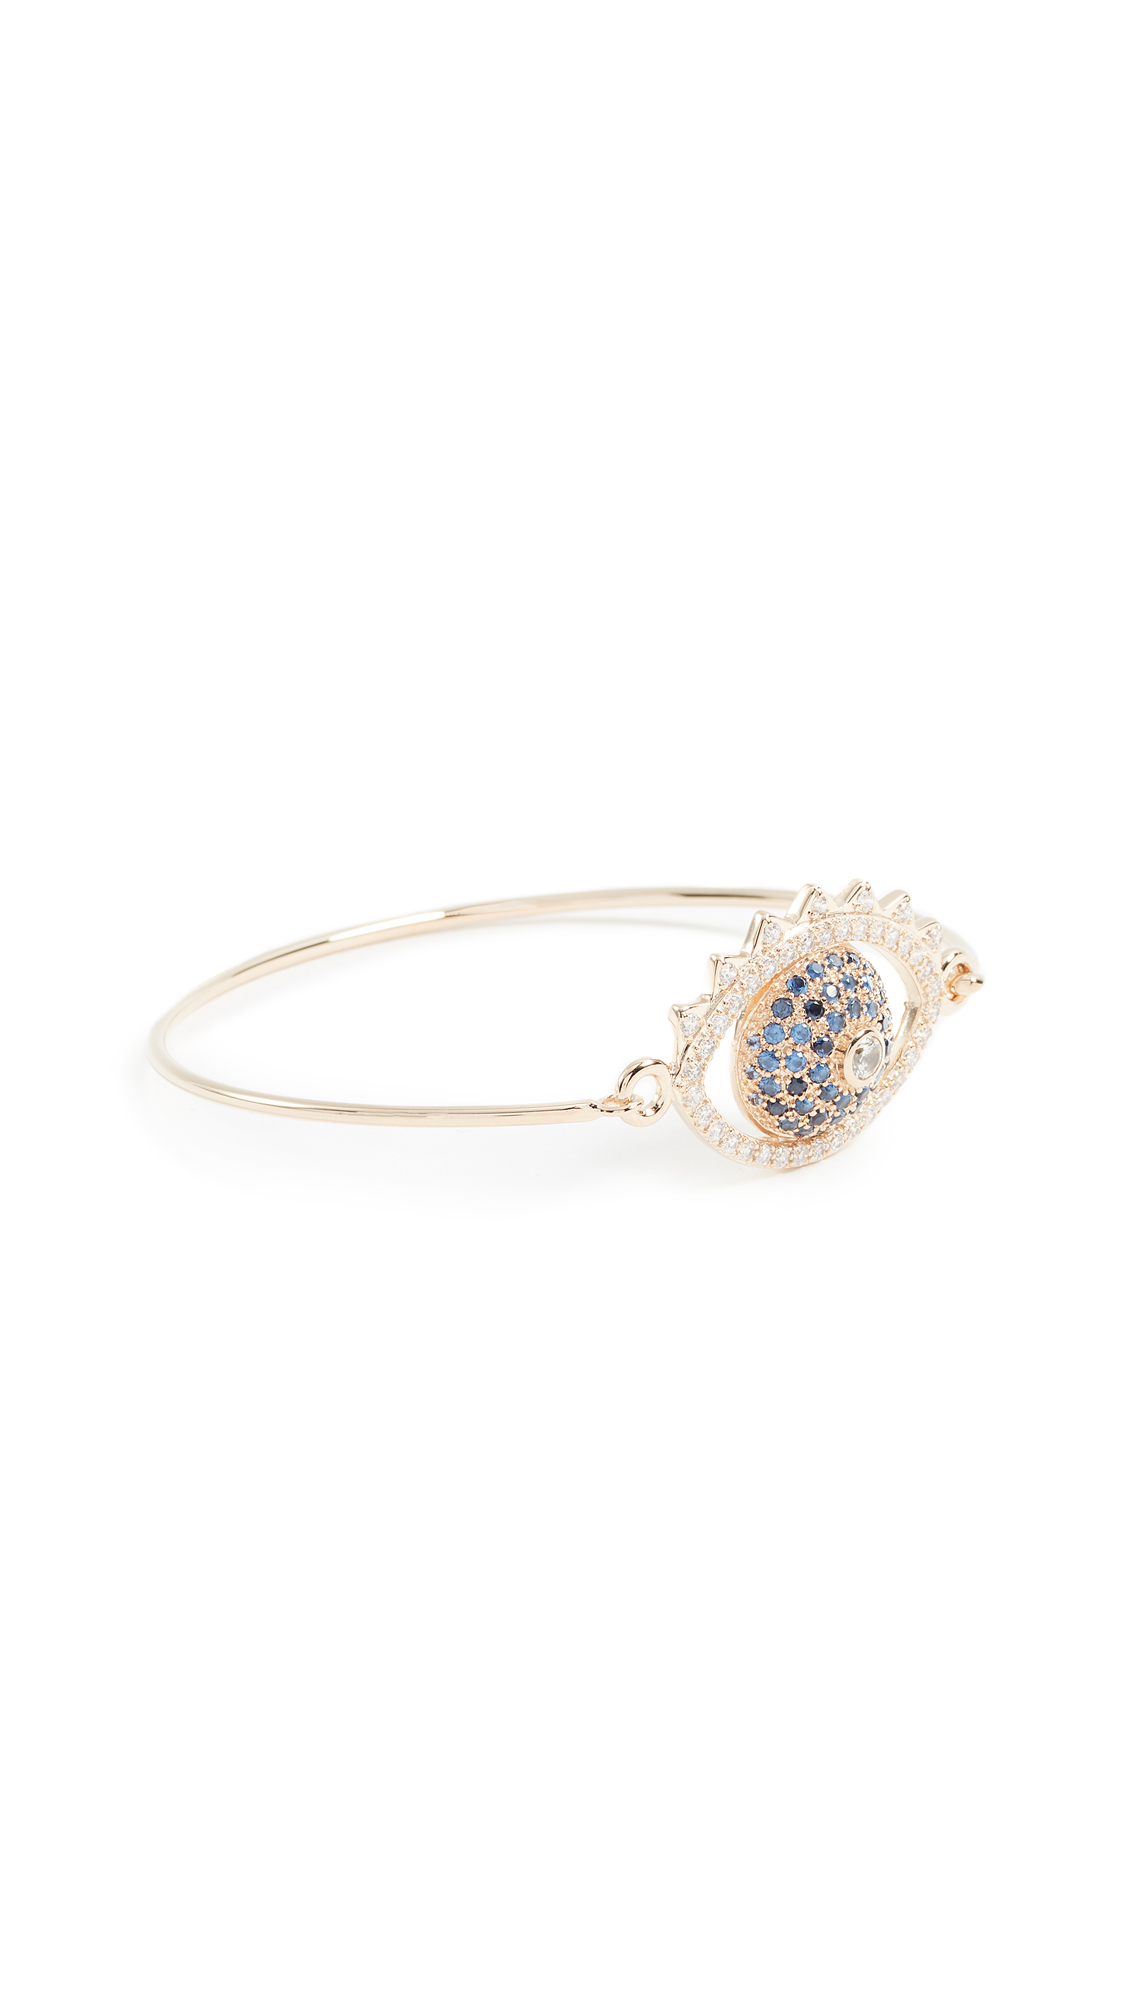 KENZO Eye Bracelet - Blue/Gold